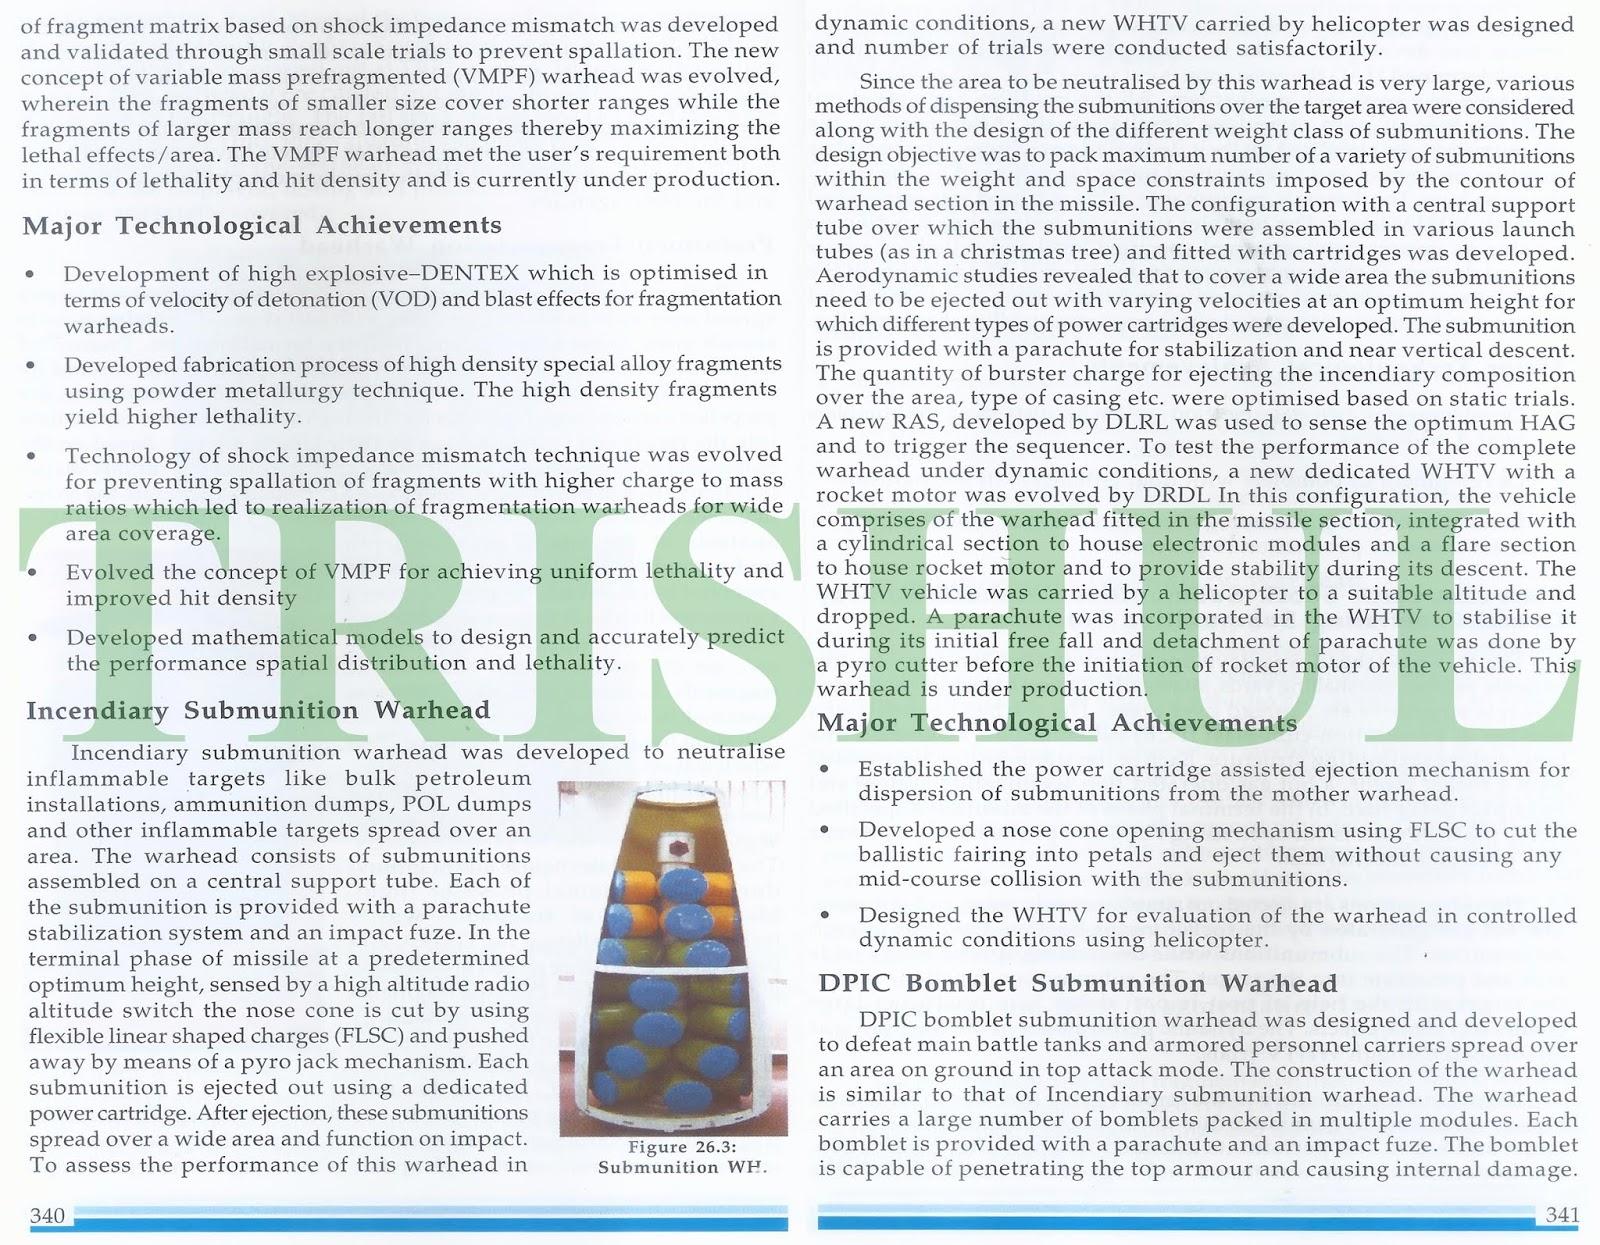 Prithvi-1 Warheads-3.jpg